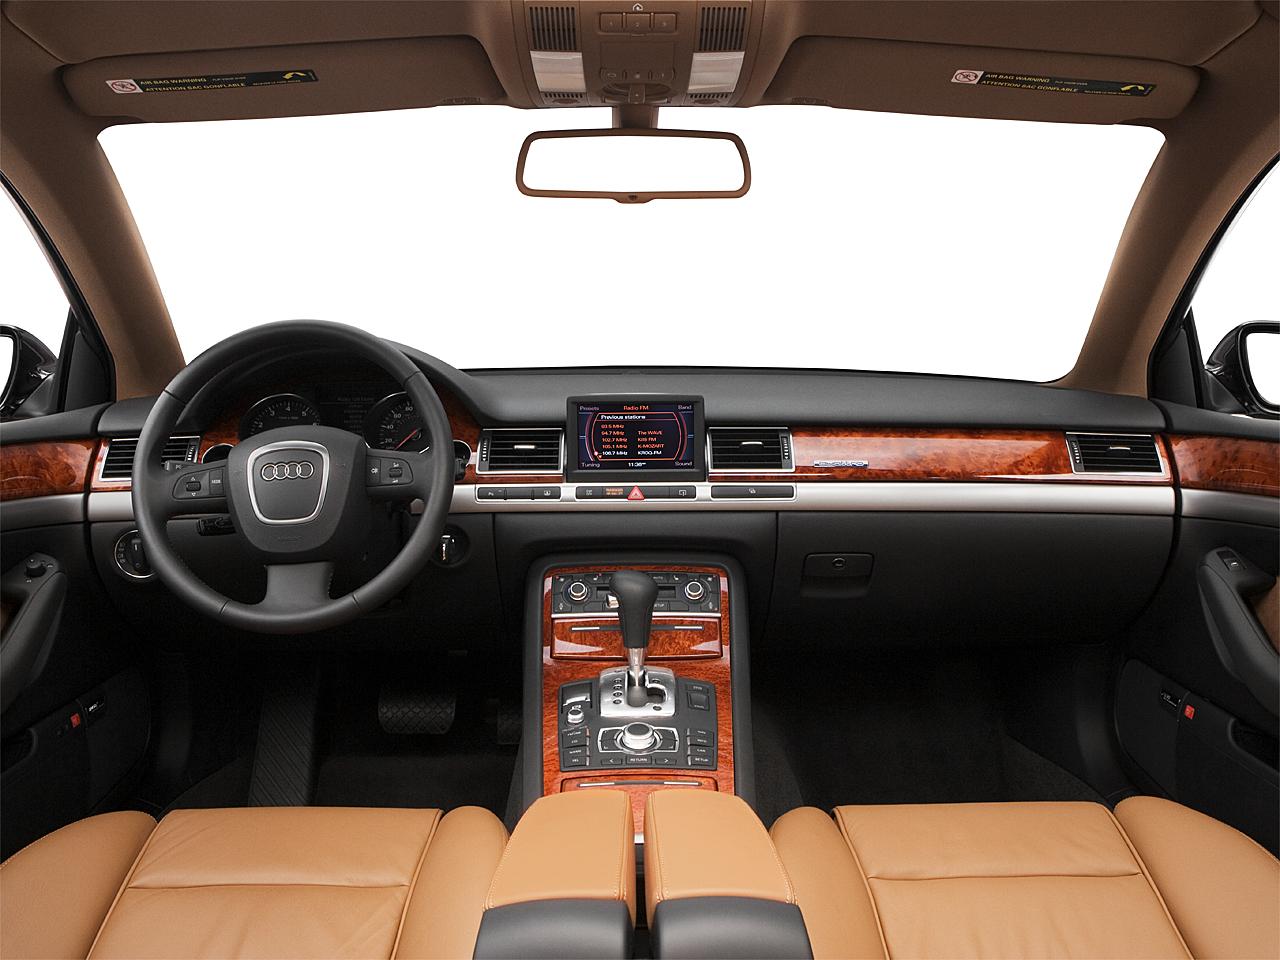 Audi A L AWD Quattro Dr Sedan Research GrooveCar - 2007 audi a8